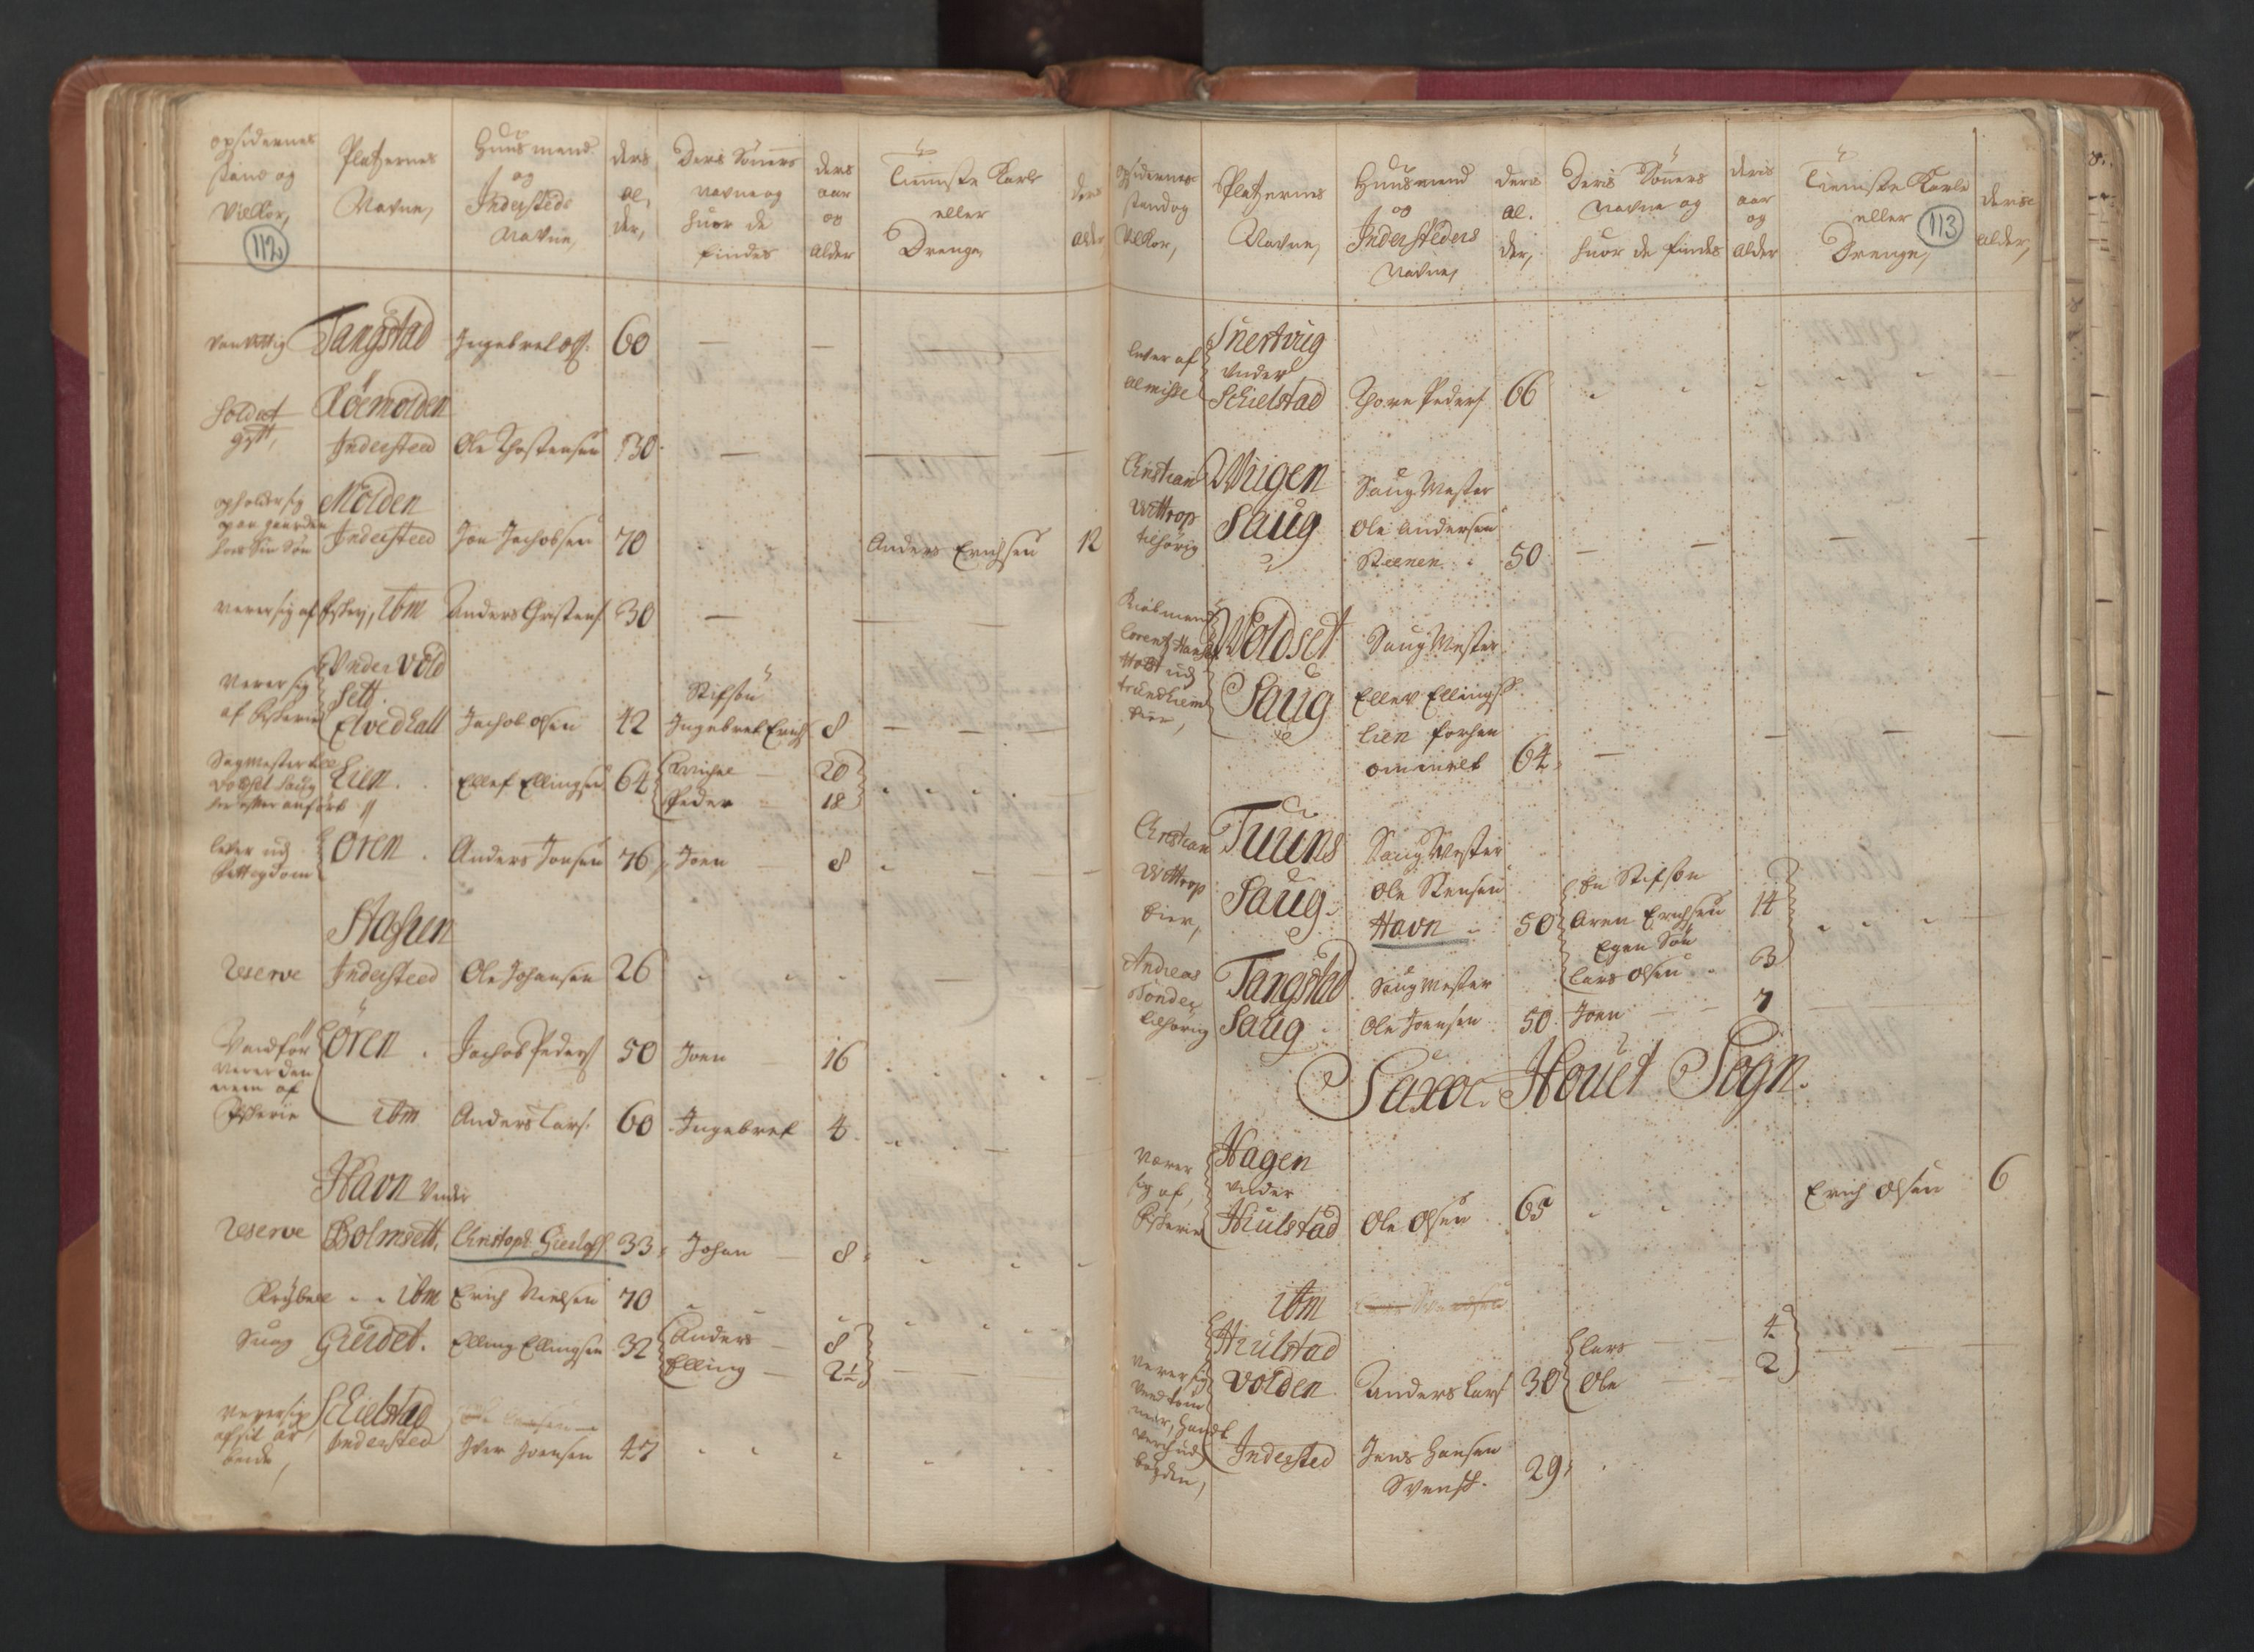 RA, Manntallet 1701, nr. 15: Inderøy fogderi og Namdal fogderi, 1701, s. 112-113